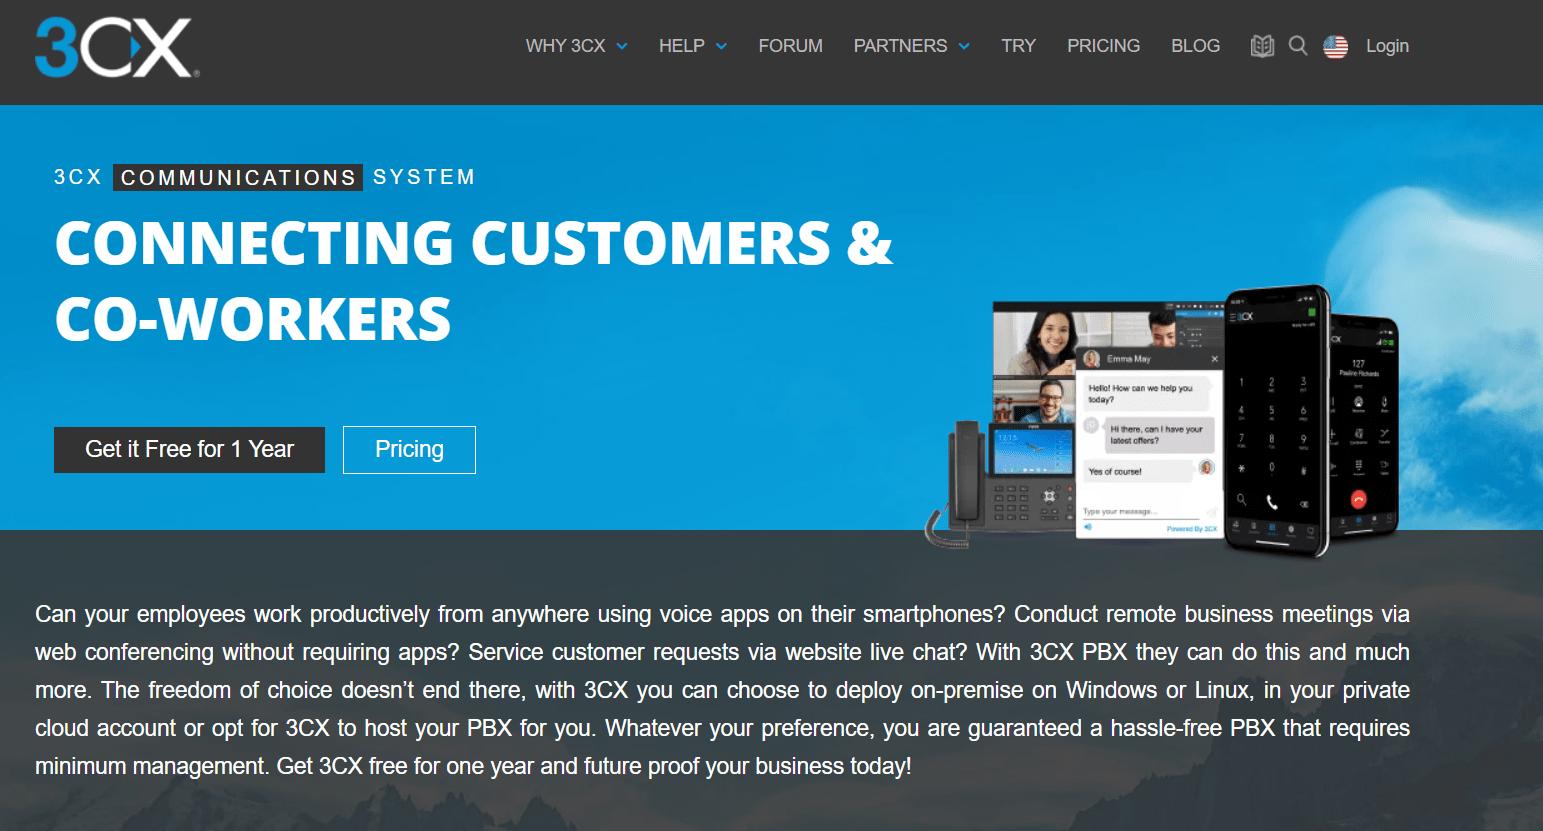 3CX Virtual Phone Number Providers in Australia